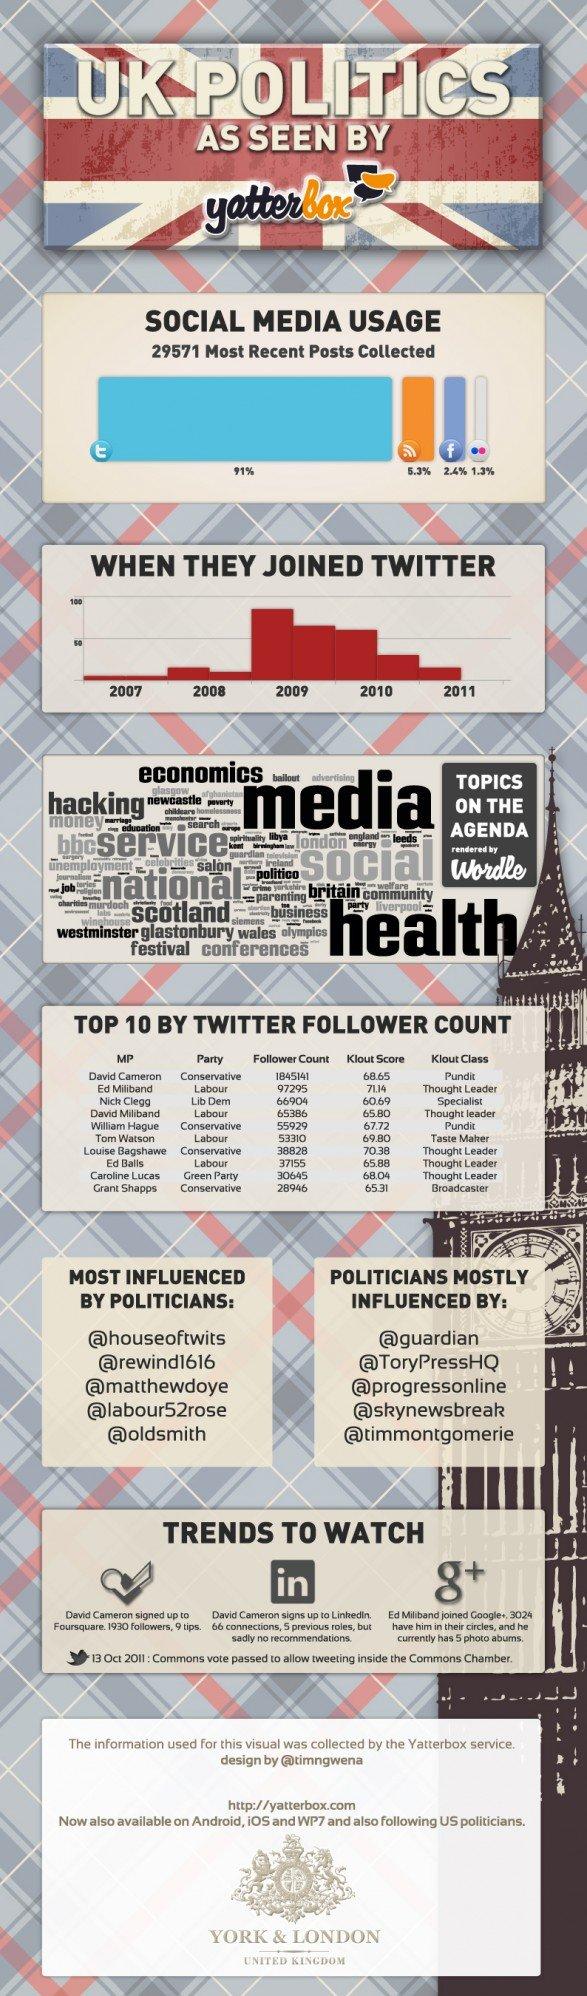 Social media in UK politics